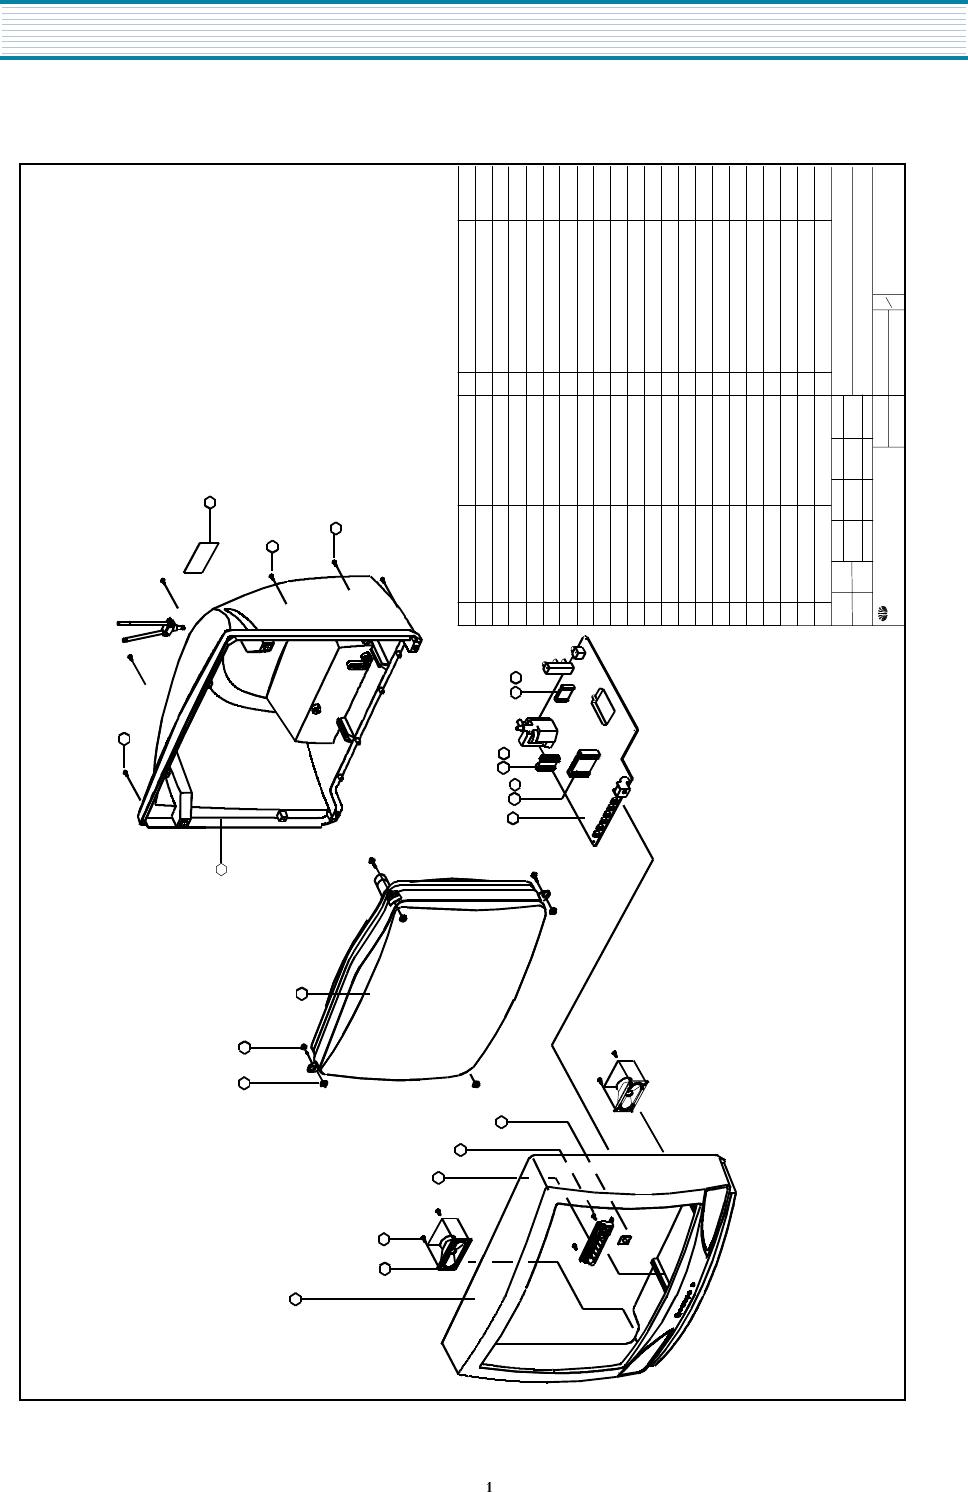 Daewoo Electronics Dtq 26S2 Fc Users Manual on